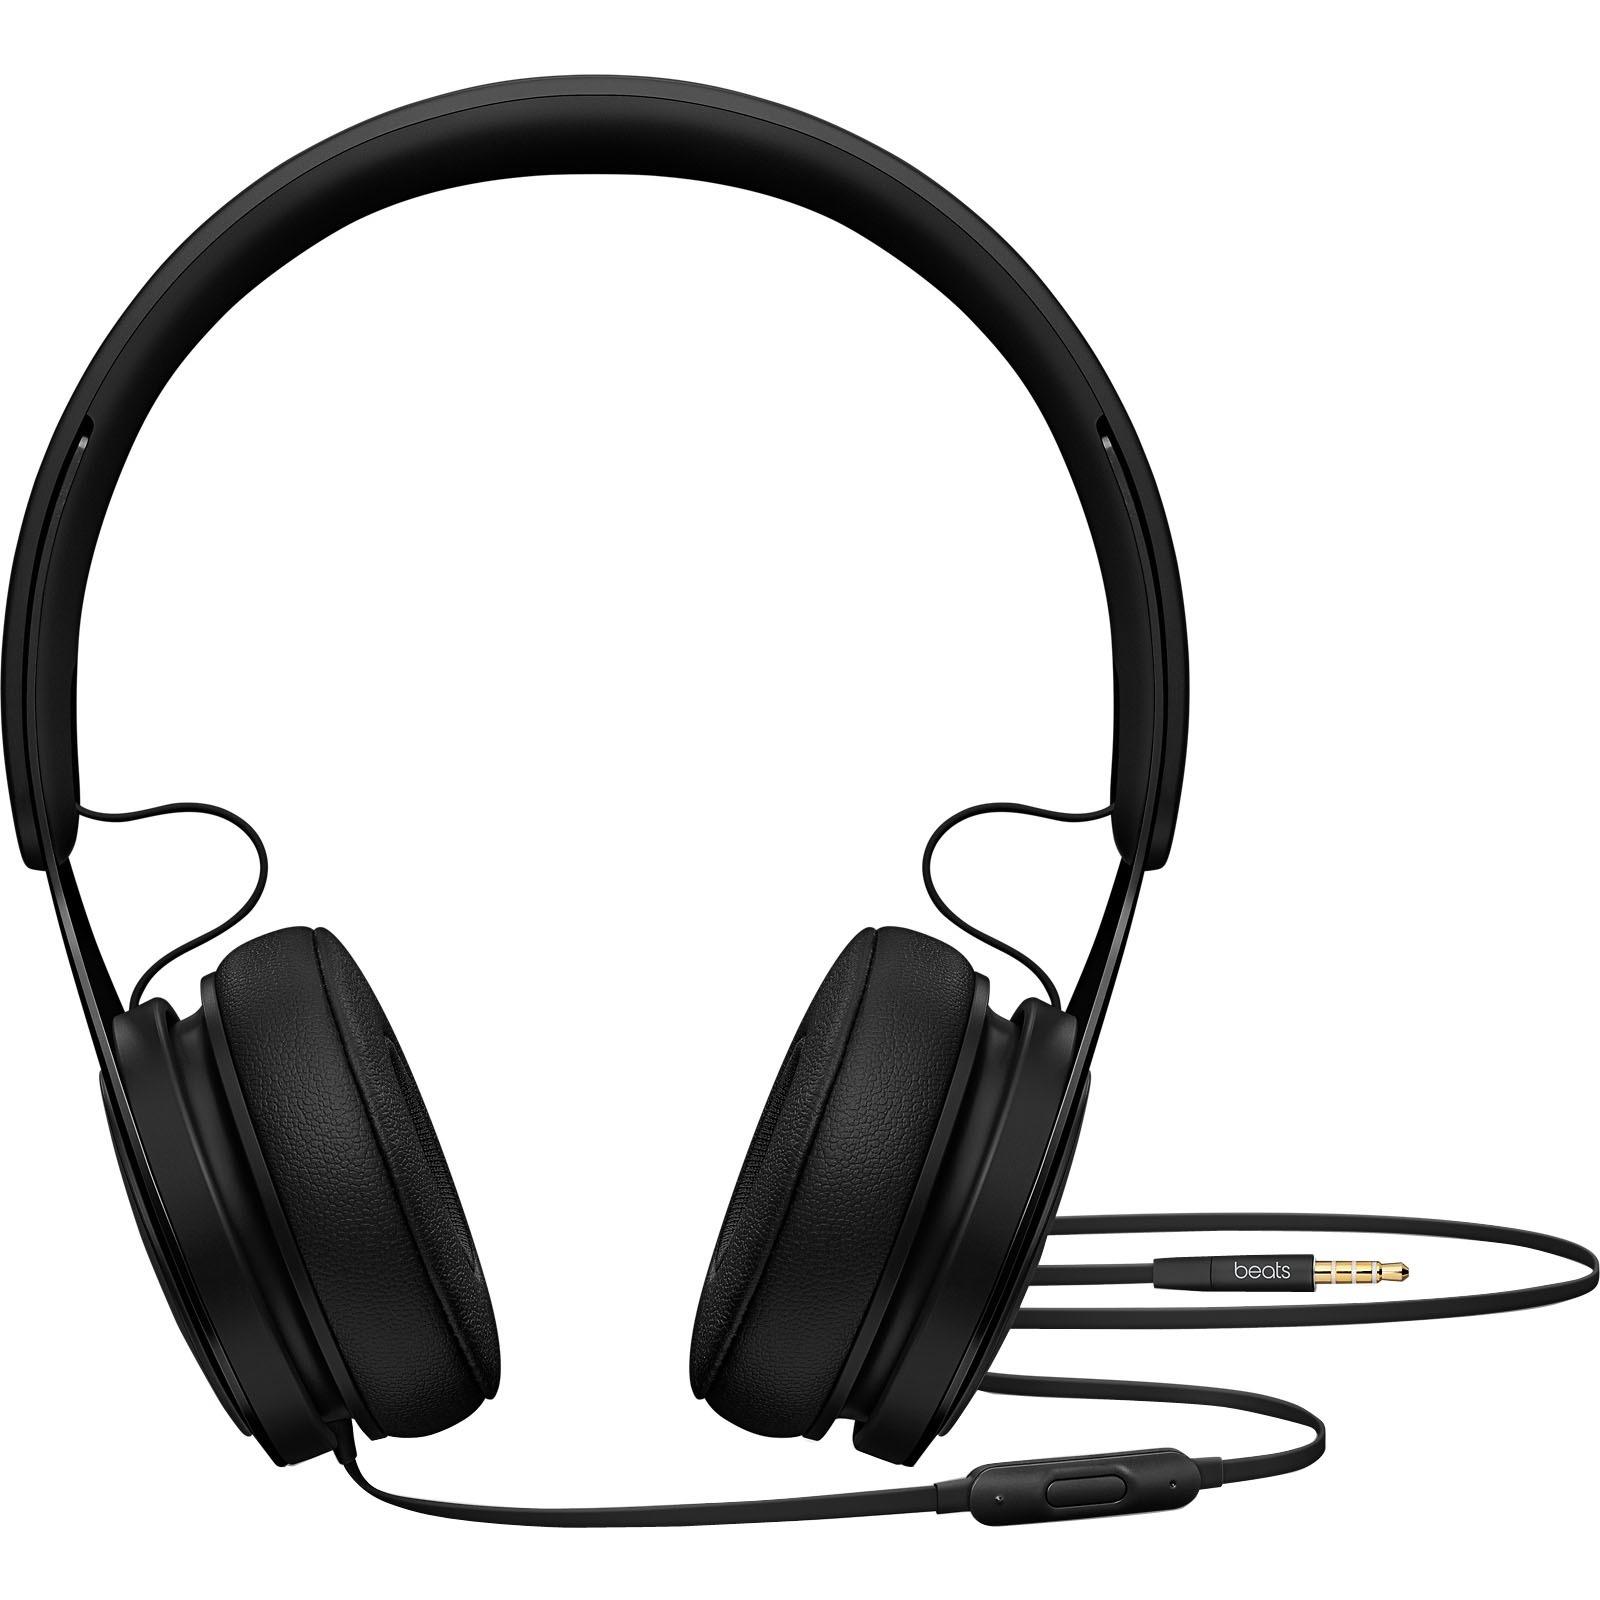 Beats by Dr. Dre EP On-Ear Headphones - Black - Stereo - Black - Mini-phone - Wired - Over-the-head - Binaural - Supra-aural 1